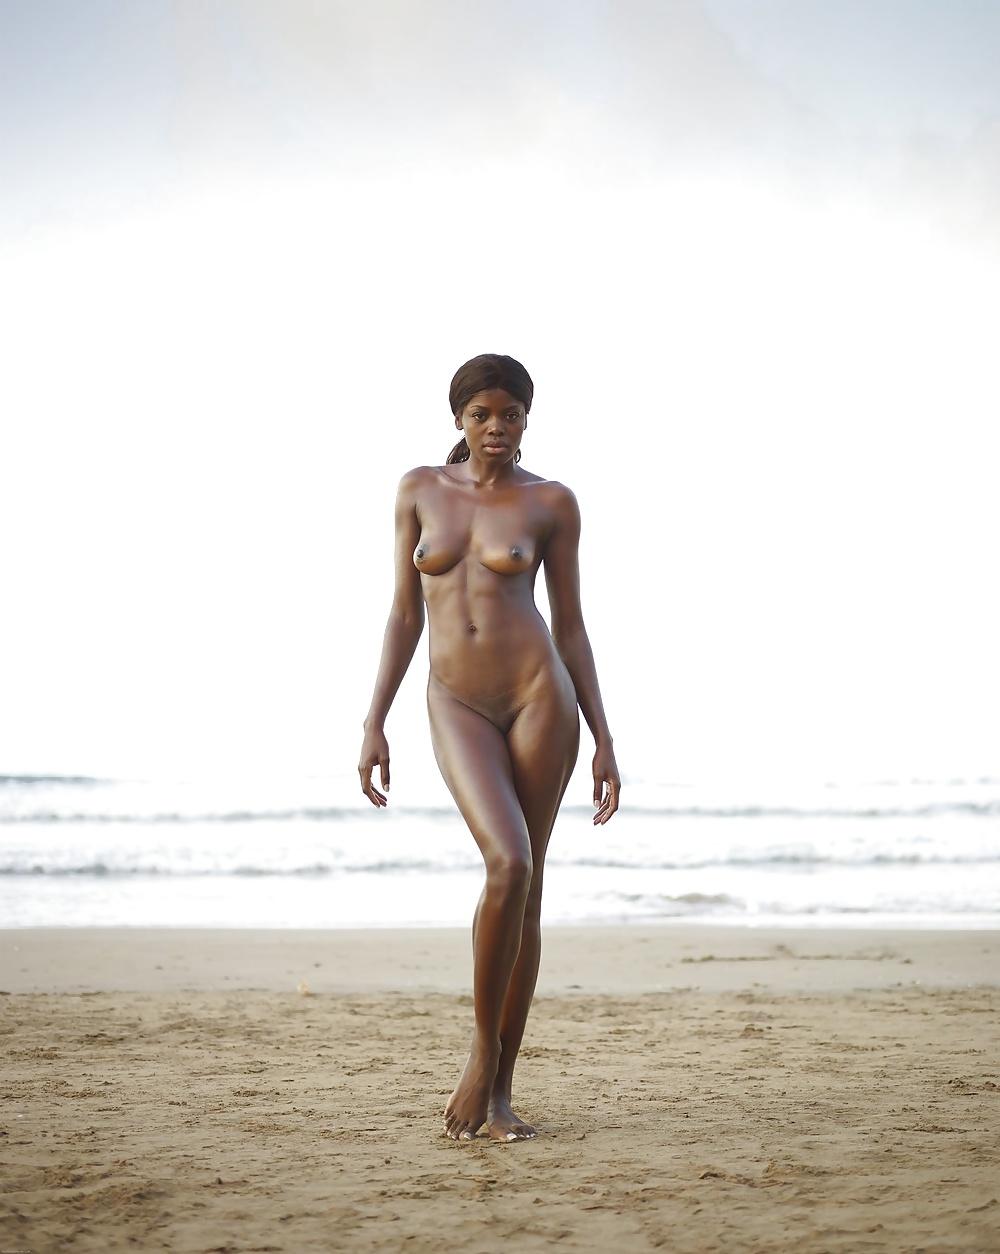 Christian nudity pics — photo 2